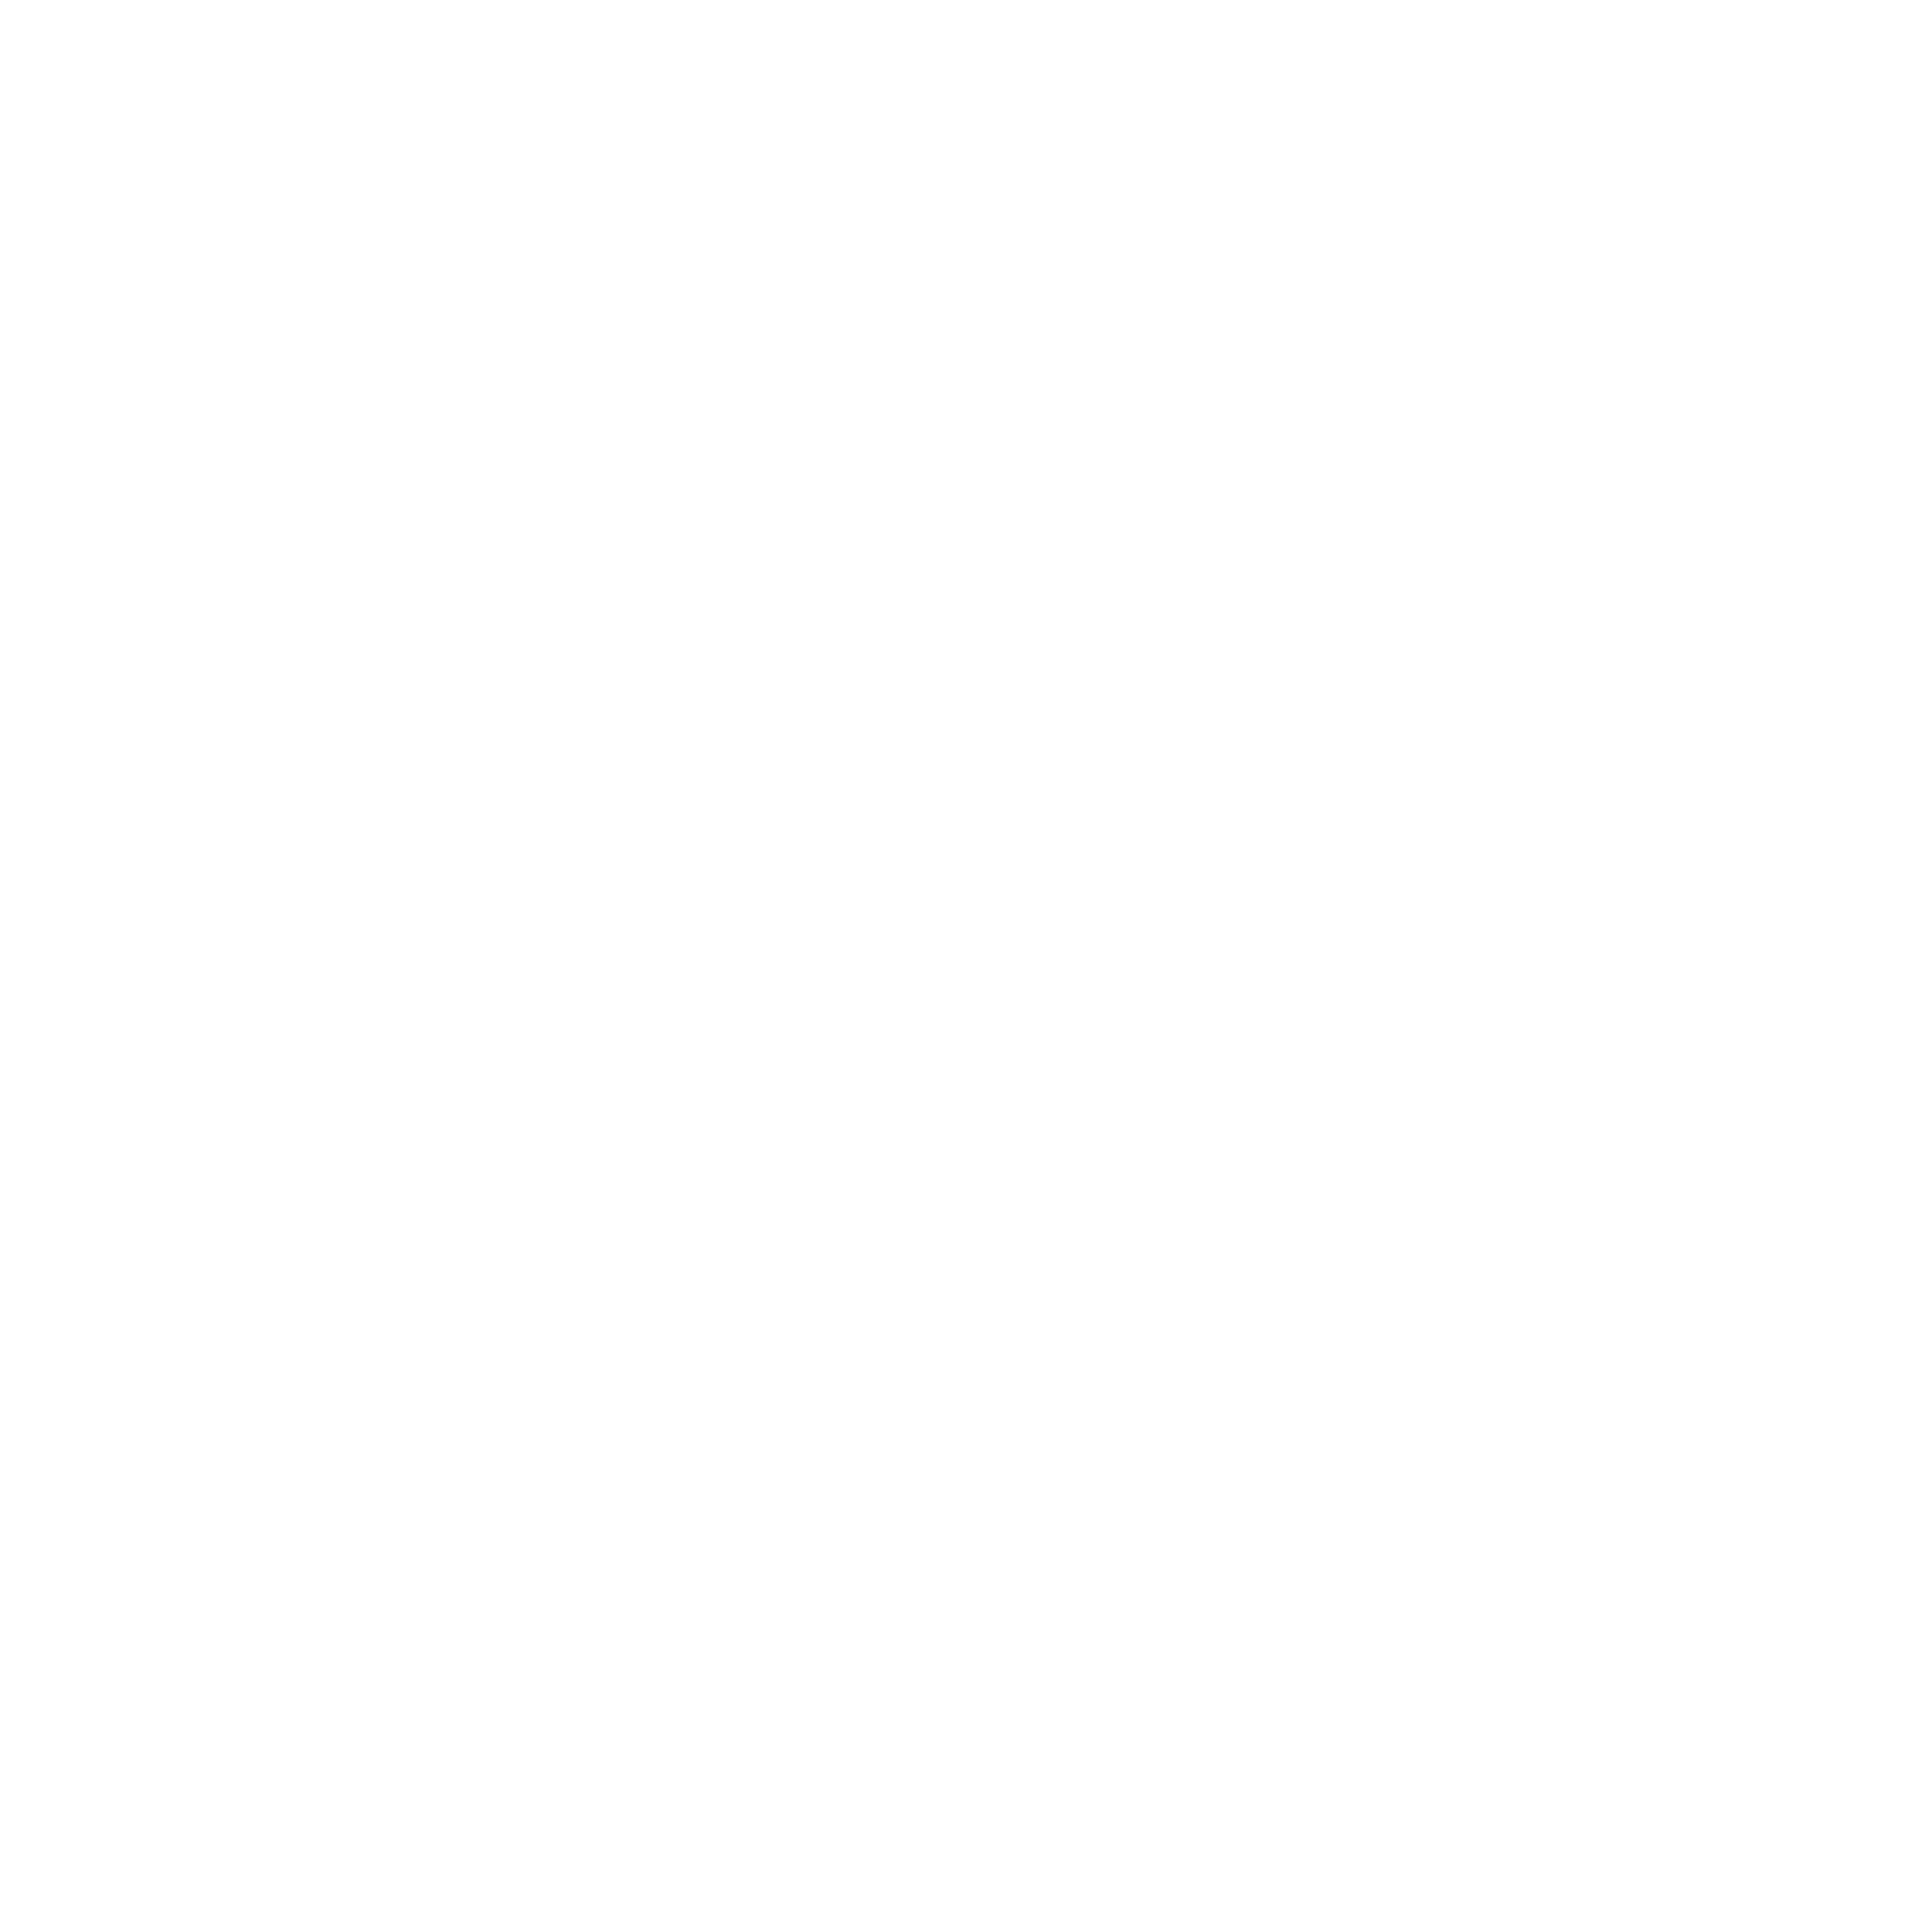 Transparent background white snowflake clipart graphic transparent download Snowflakes Background Decoration Transparent Clip Art | Gallery ... graphic transparent download